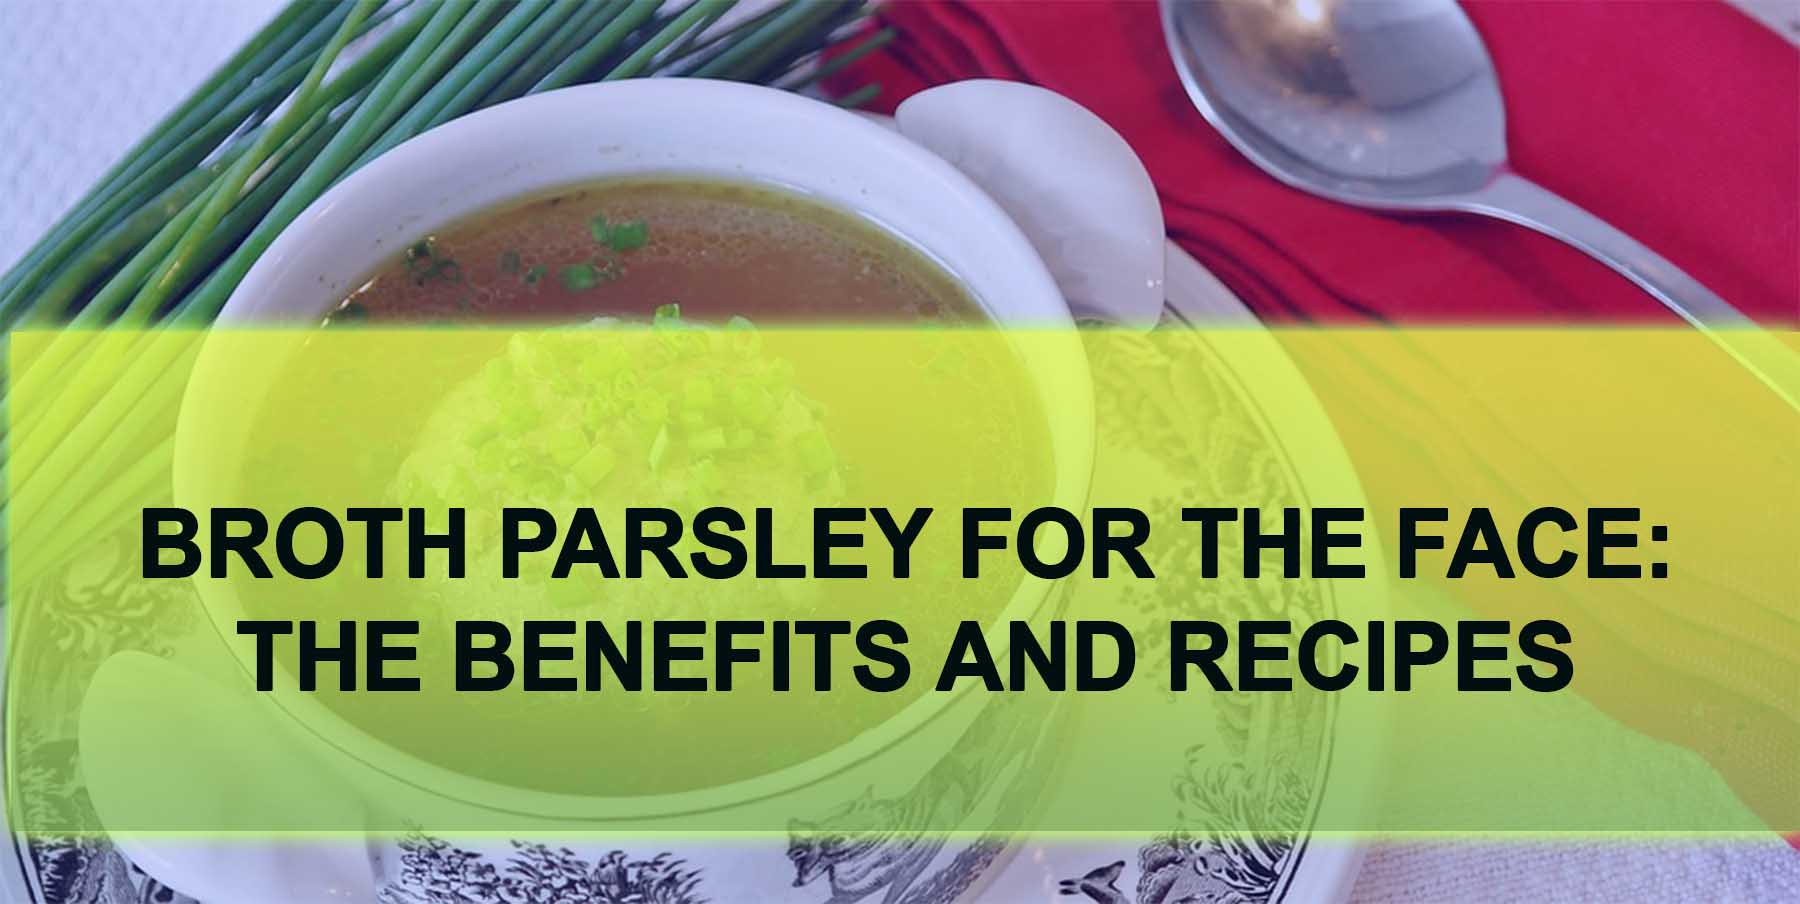 The fresh Parsley Benefits, Nutrition & Recipe